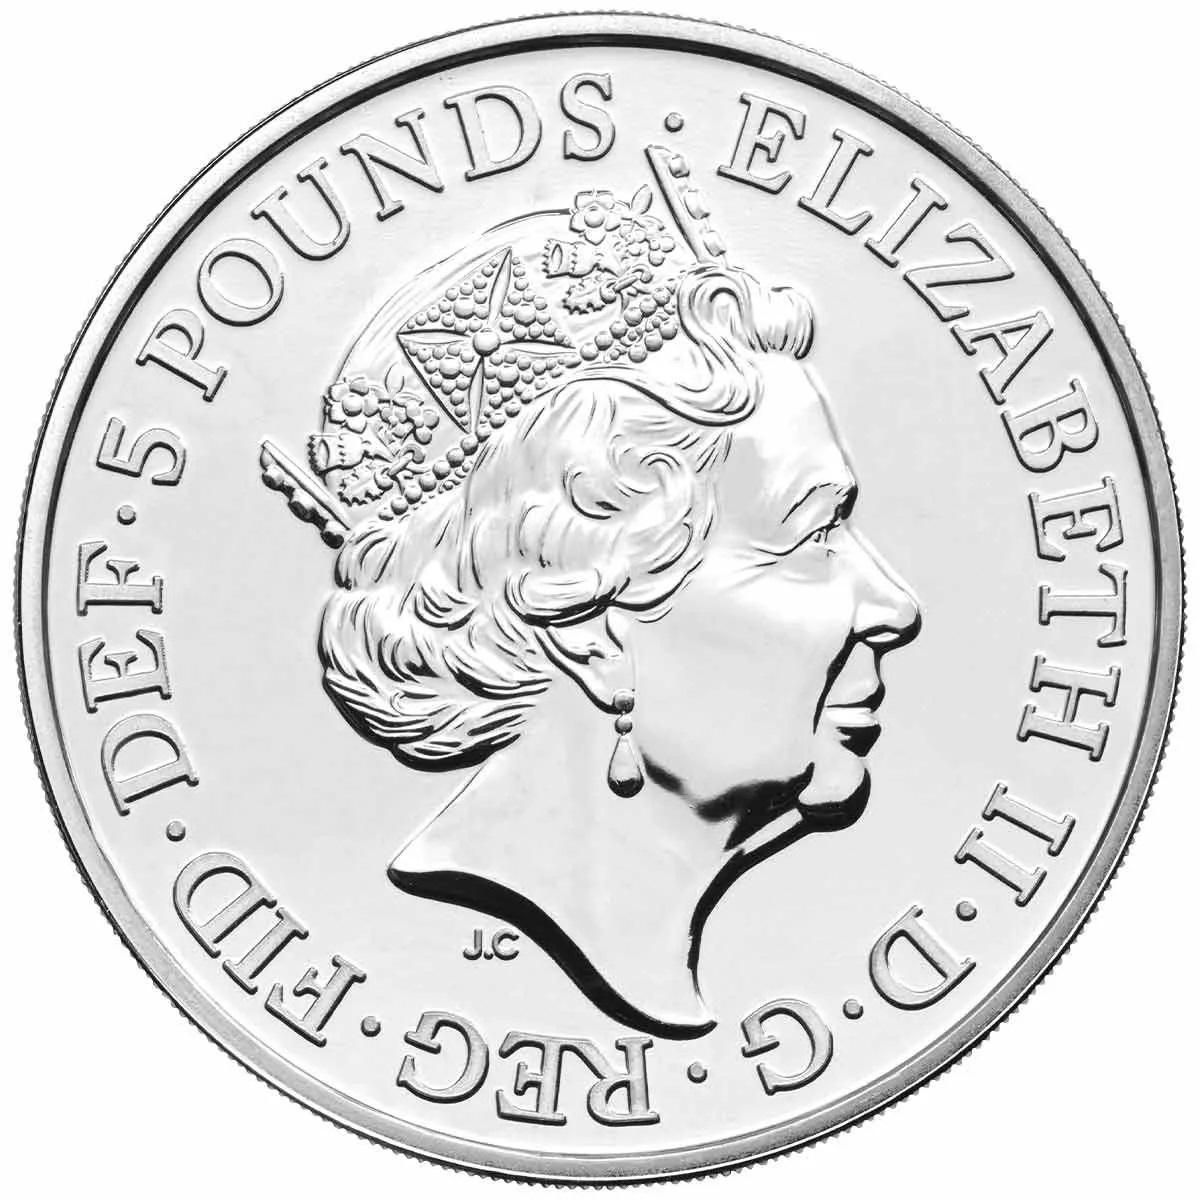 Британия серебряная монета 5 фунтов 2021, аверс